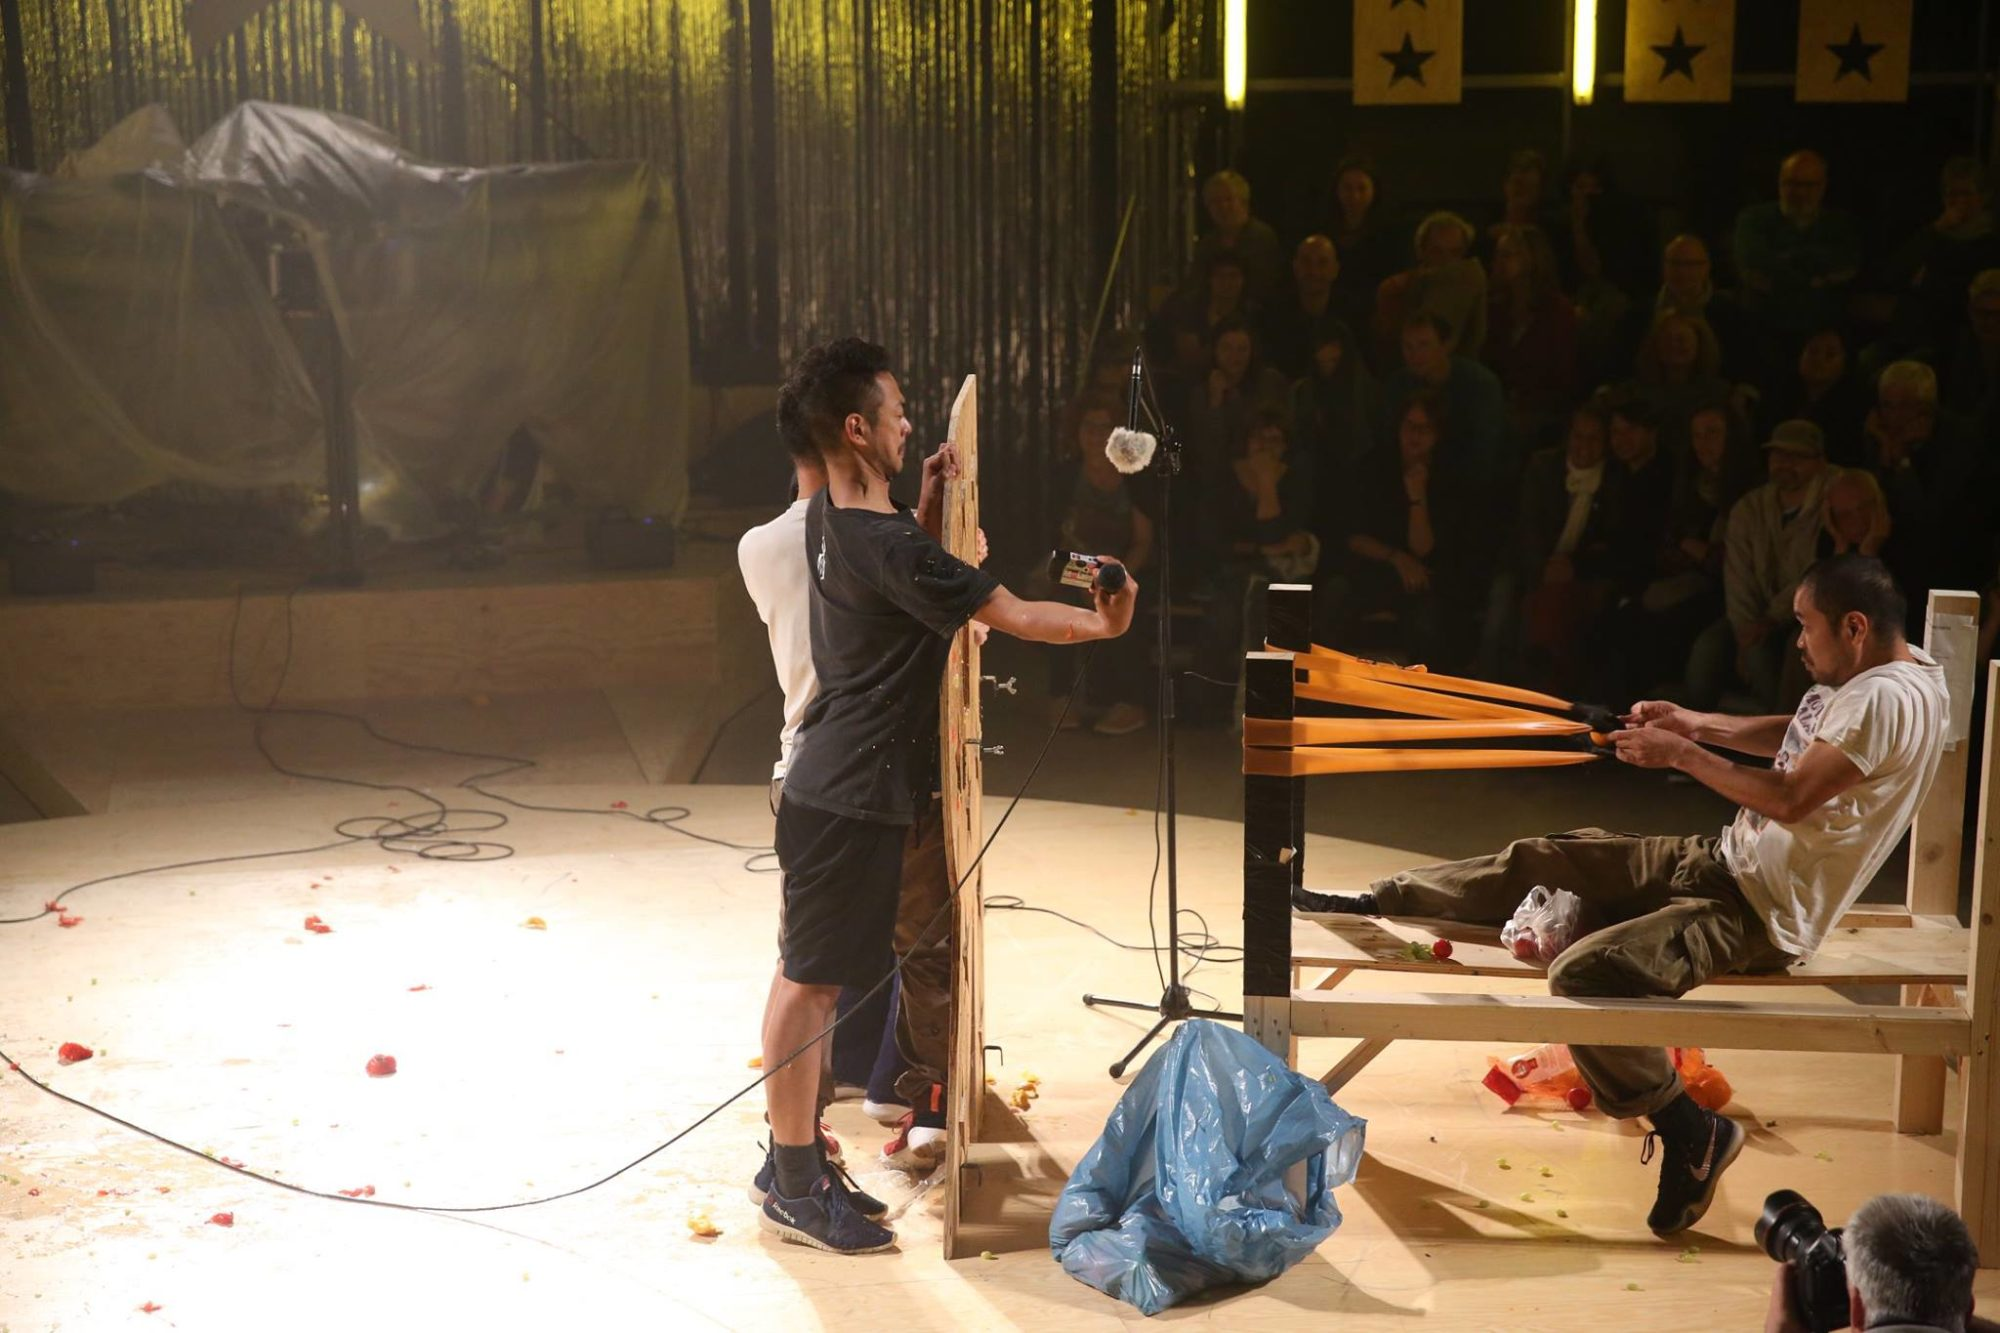 Un cirque international de performances - Nanterre-Amandiers